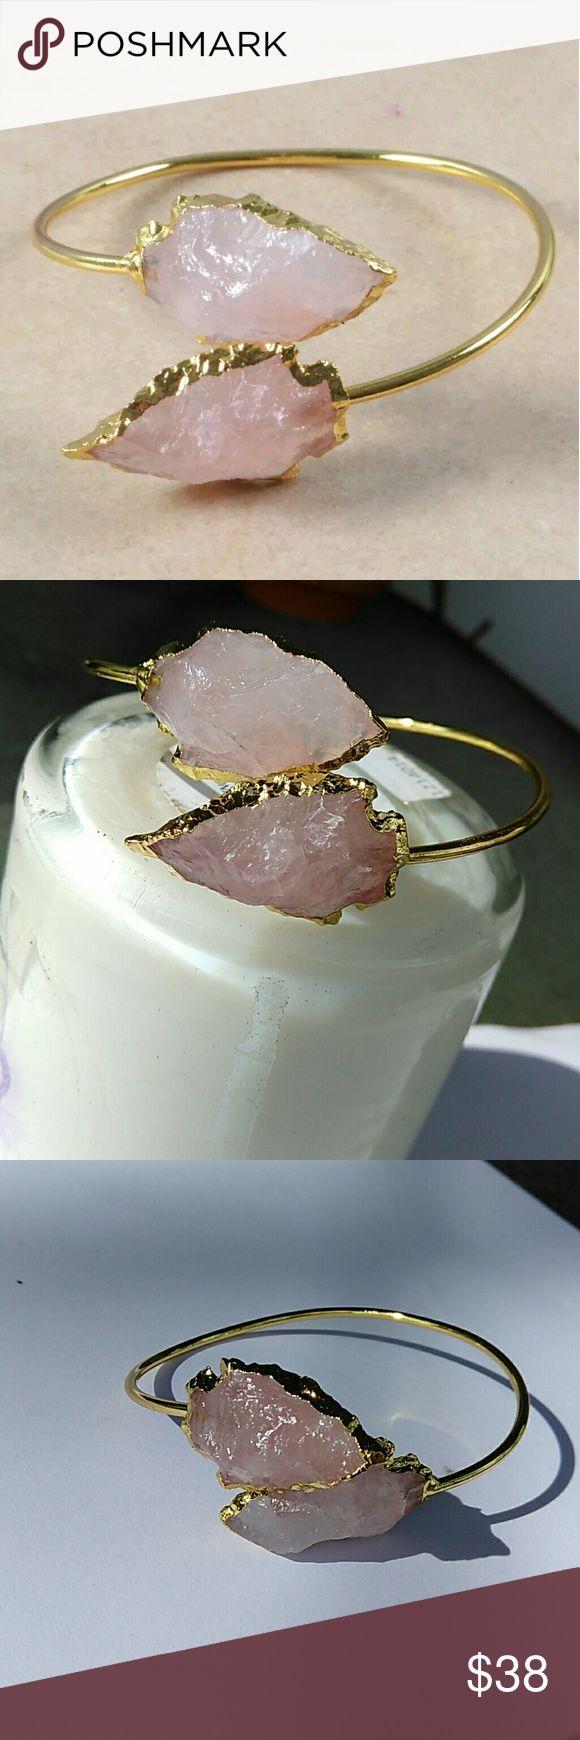 Rose quartz Arrowhead bangle Elegant rose quartz arrowheads in a gold setting This is brand new   Hand knapped  Made in India Fair trade    Inner dia. 32x20x10 mm (millimeter) Jewelry Bracelets